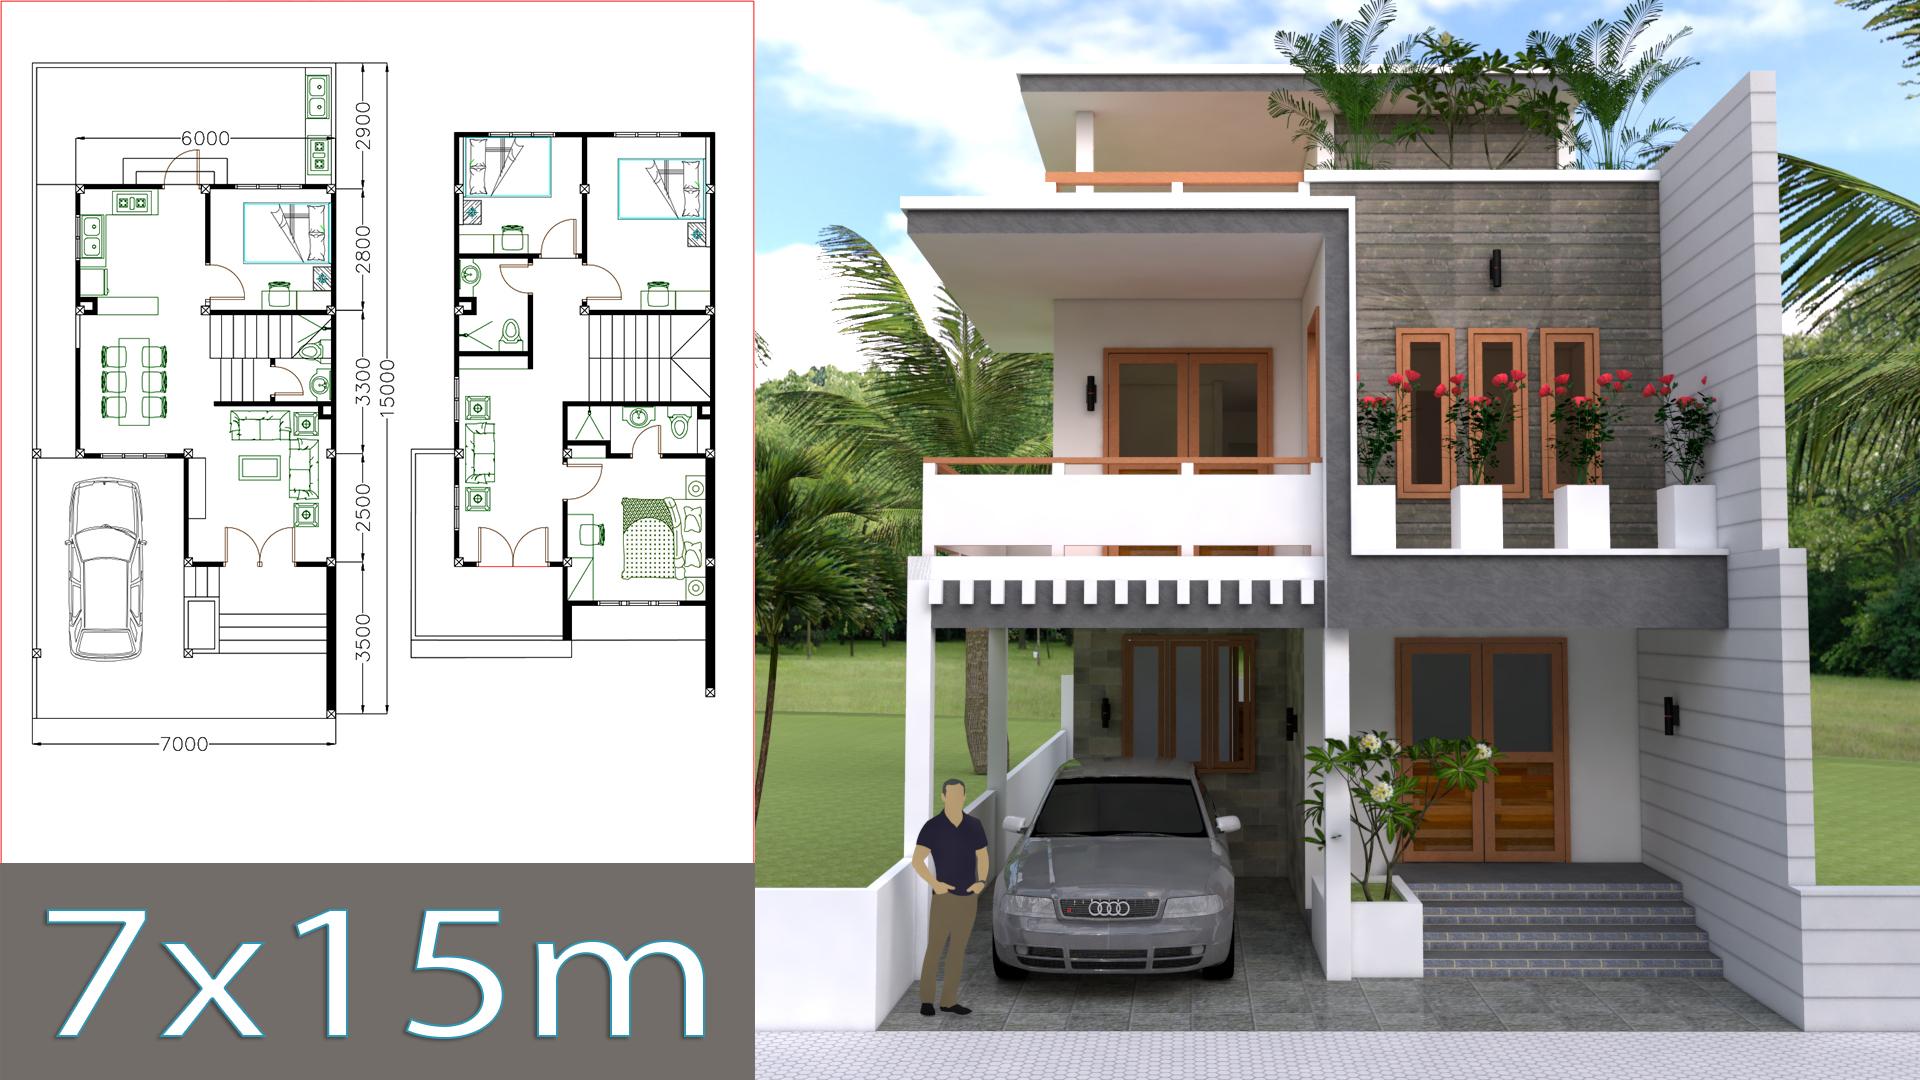 Home Design Plan 7x15m With 4 Bedrooms Samphoas Plan